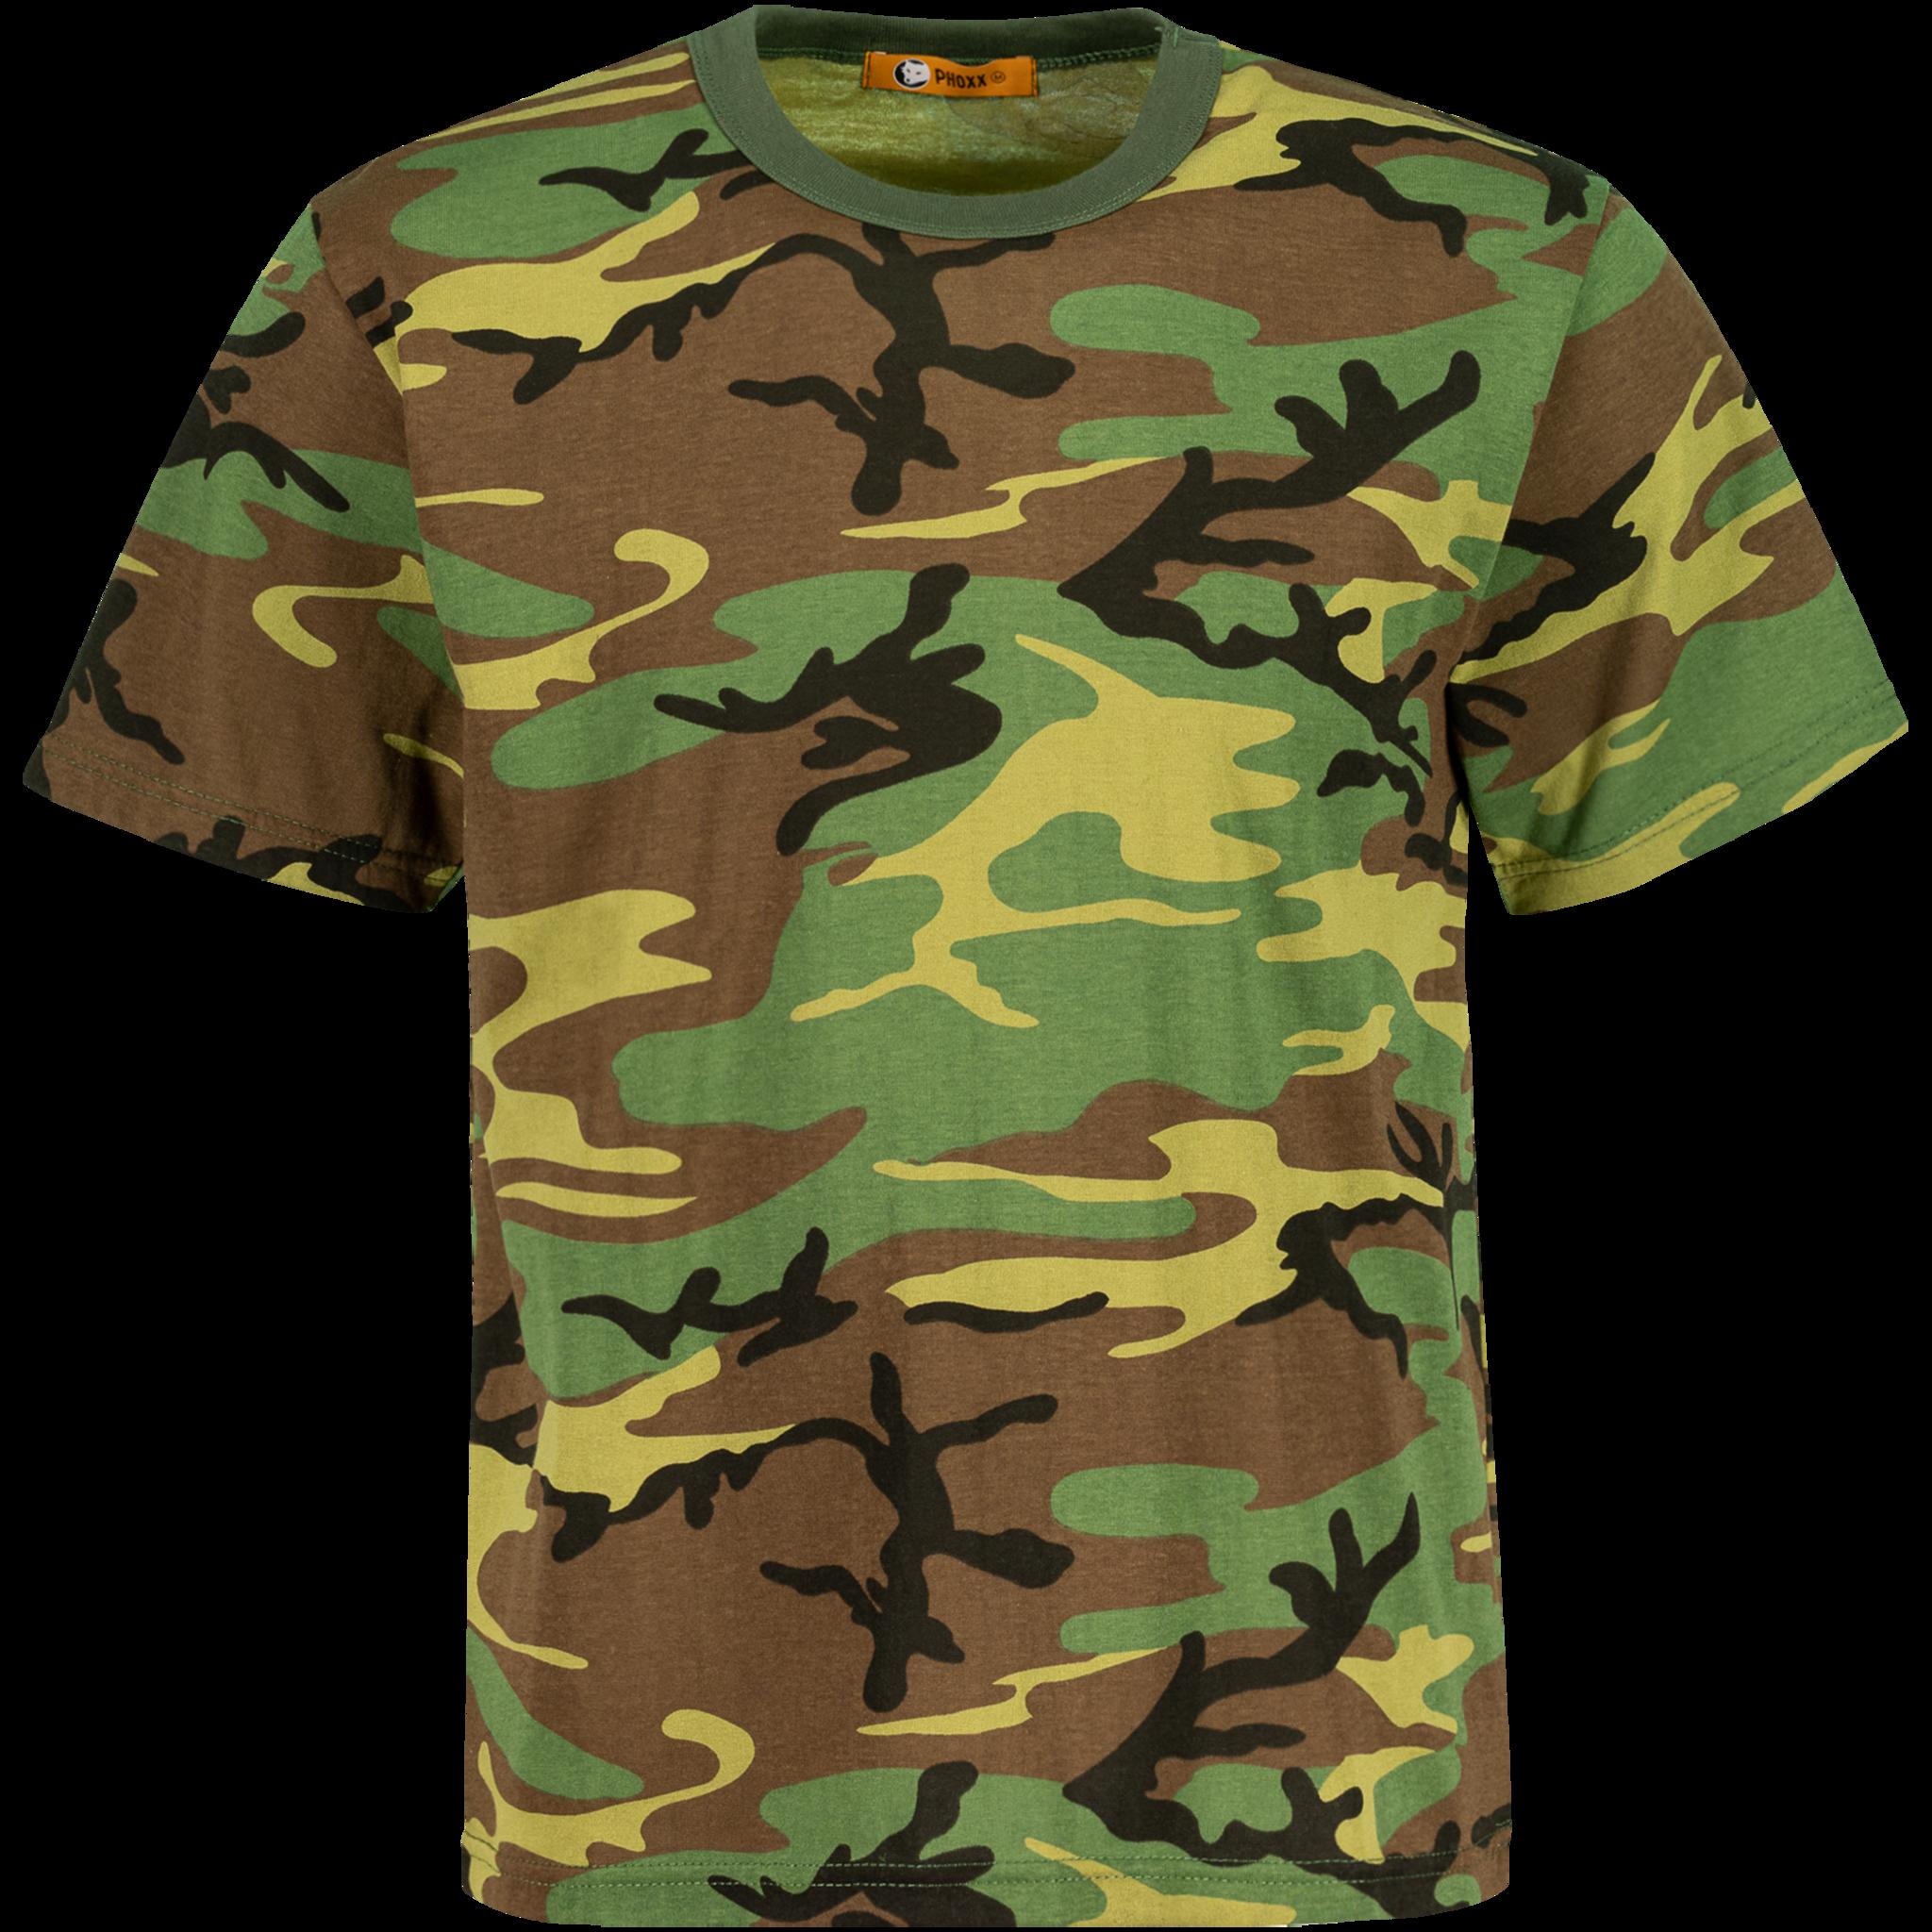 Phoxx Camo t shirt Green Camo Grön T shirts   XXL